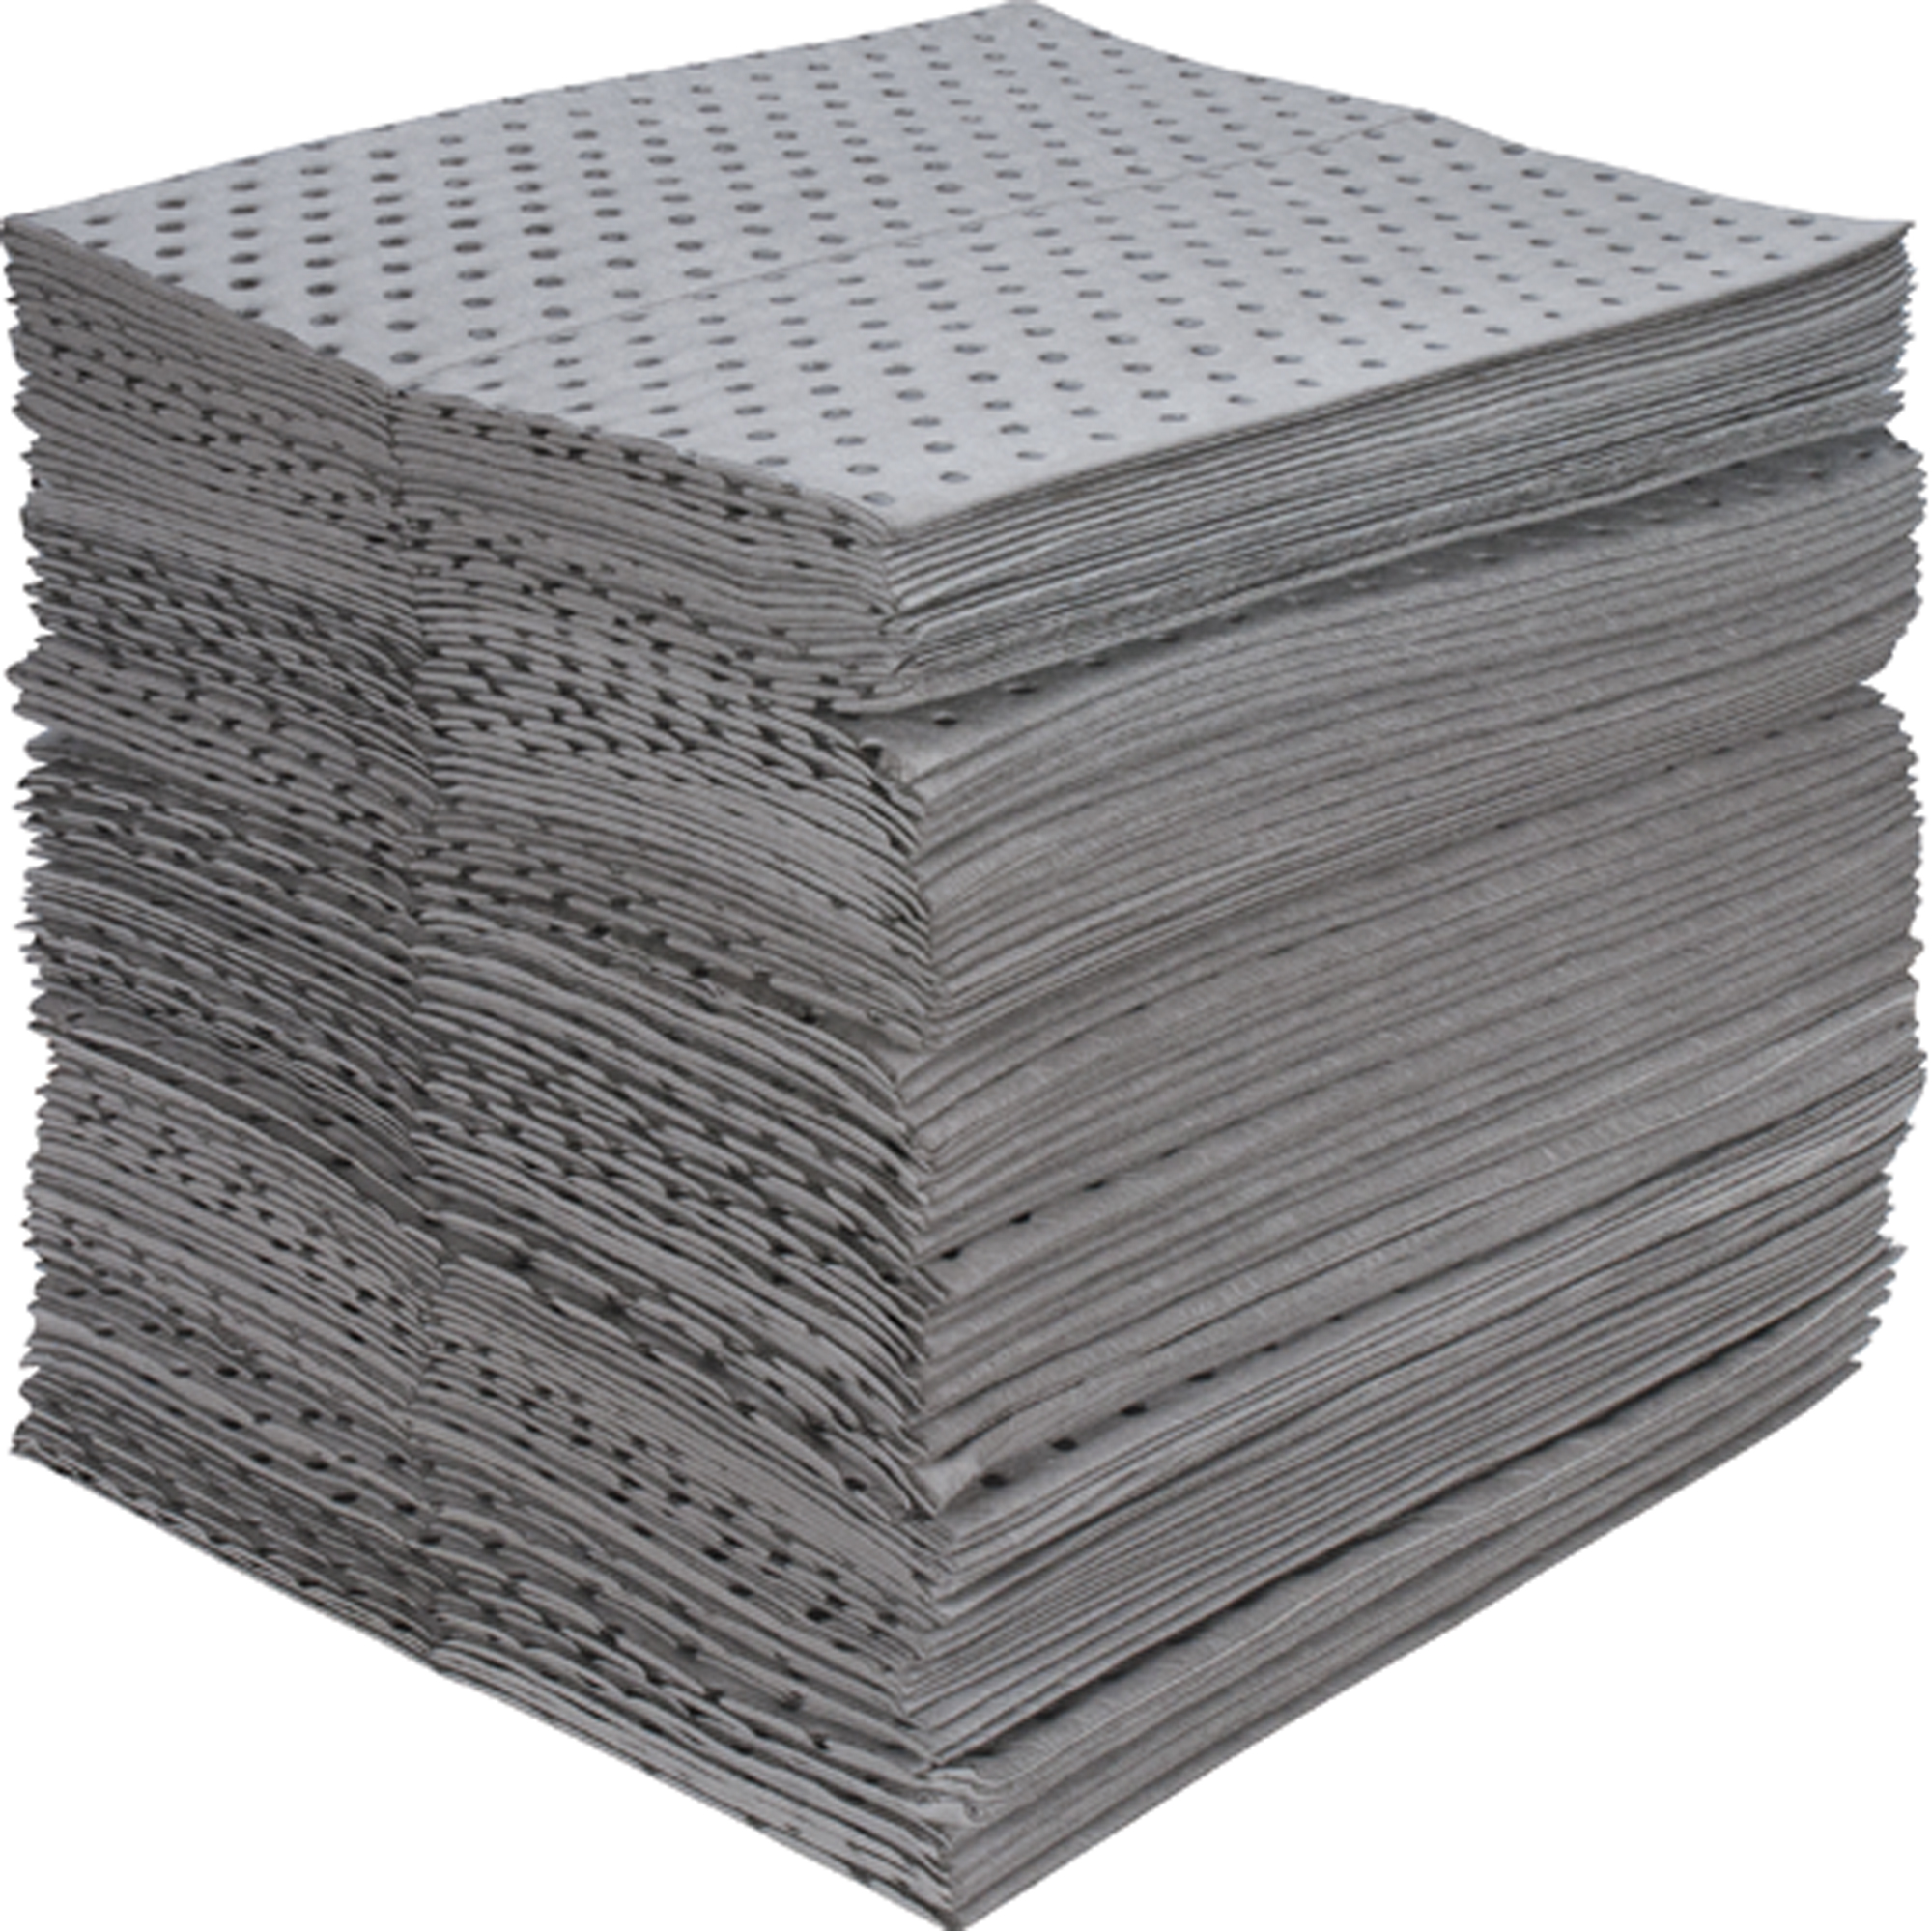 Feuilles d'absorbants en fibres fines - Calibre industriel - Universel - image 1 de 1